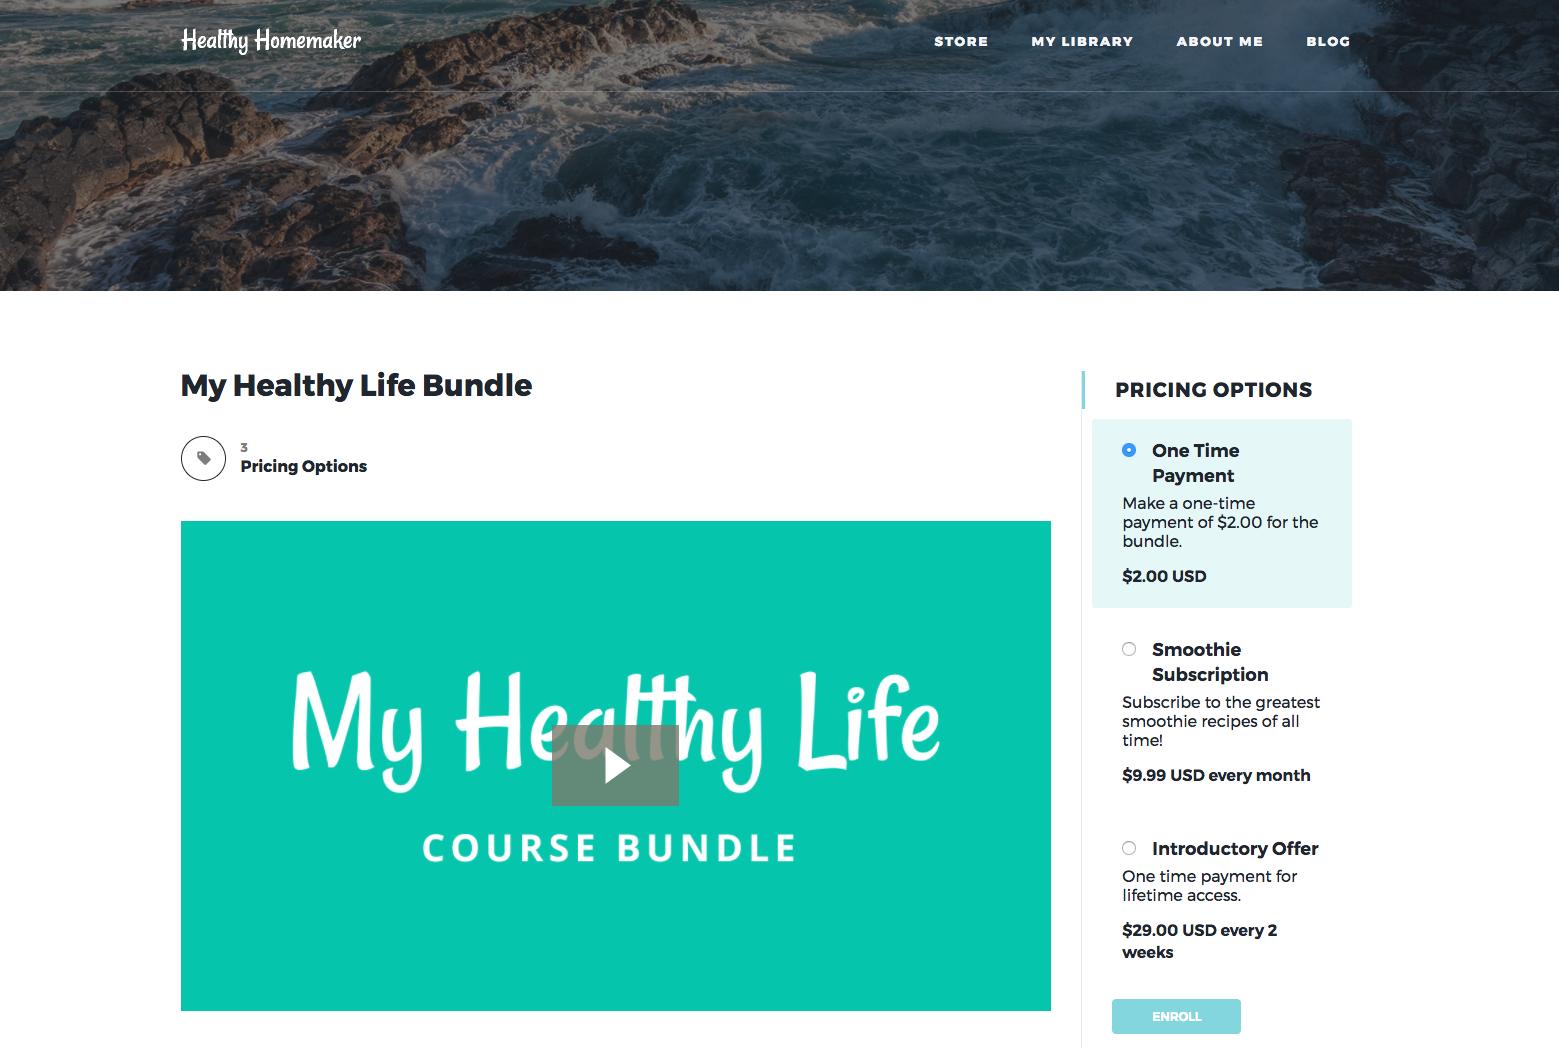 Screenshot of Kajabi online course bundle about healthy living